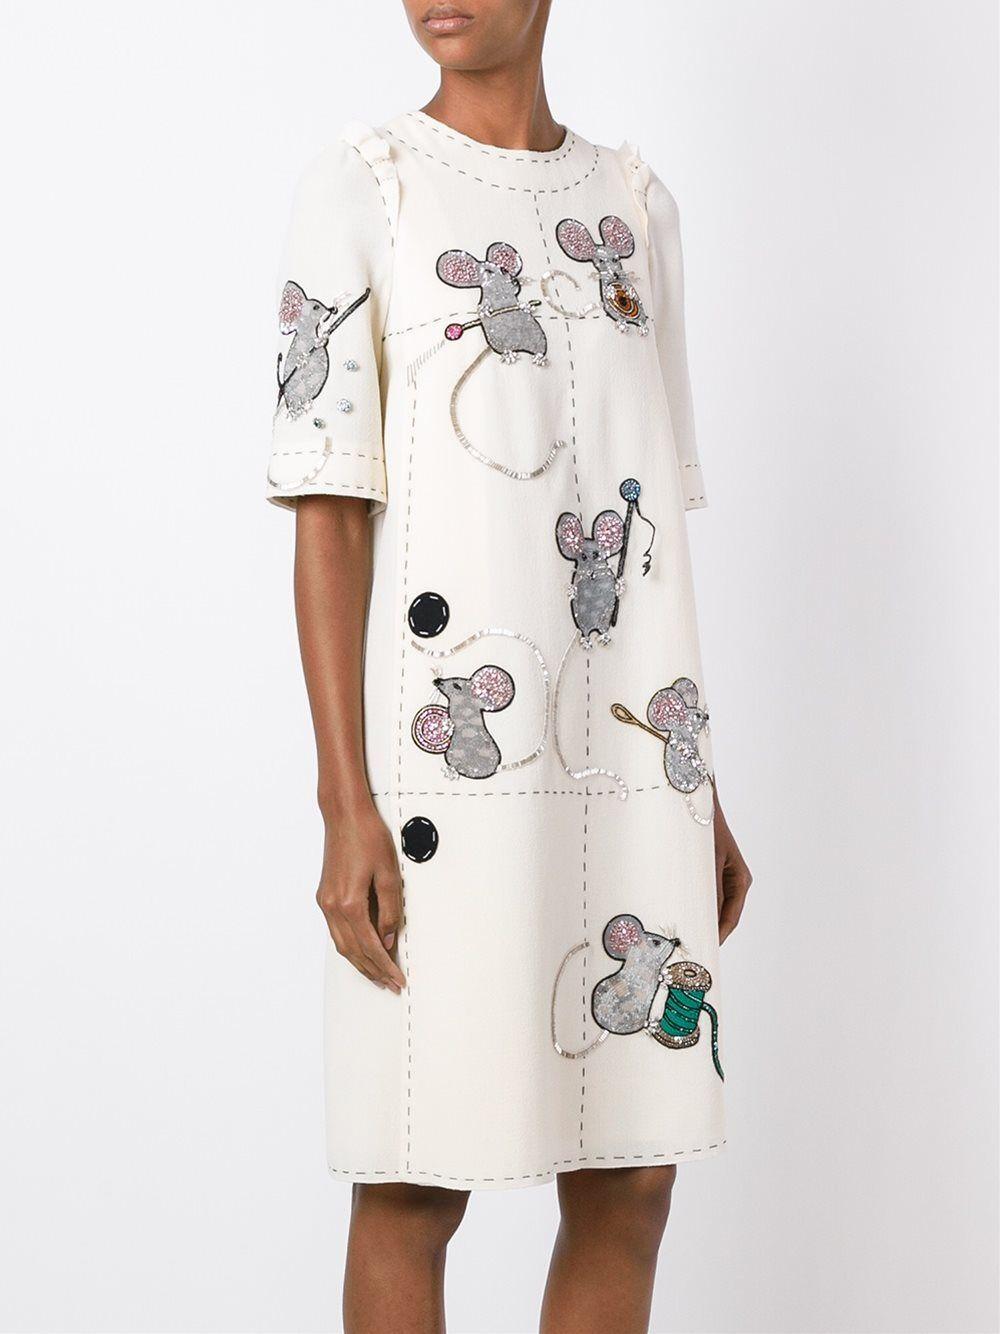 a96ffc191c81d19 Dolce & Gabbana платье с вышивкой мышей   ДОЛЬЧЕ in 2019   Платья ...